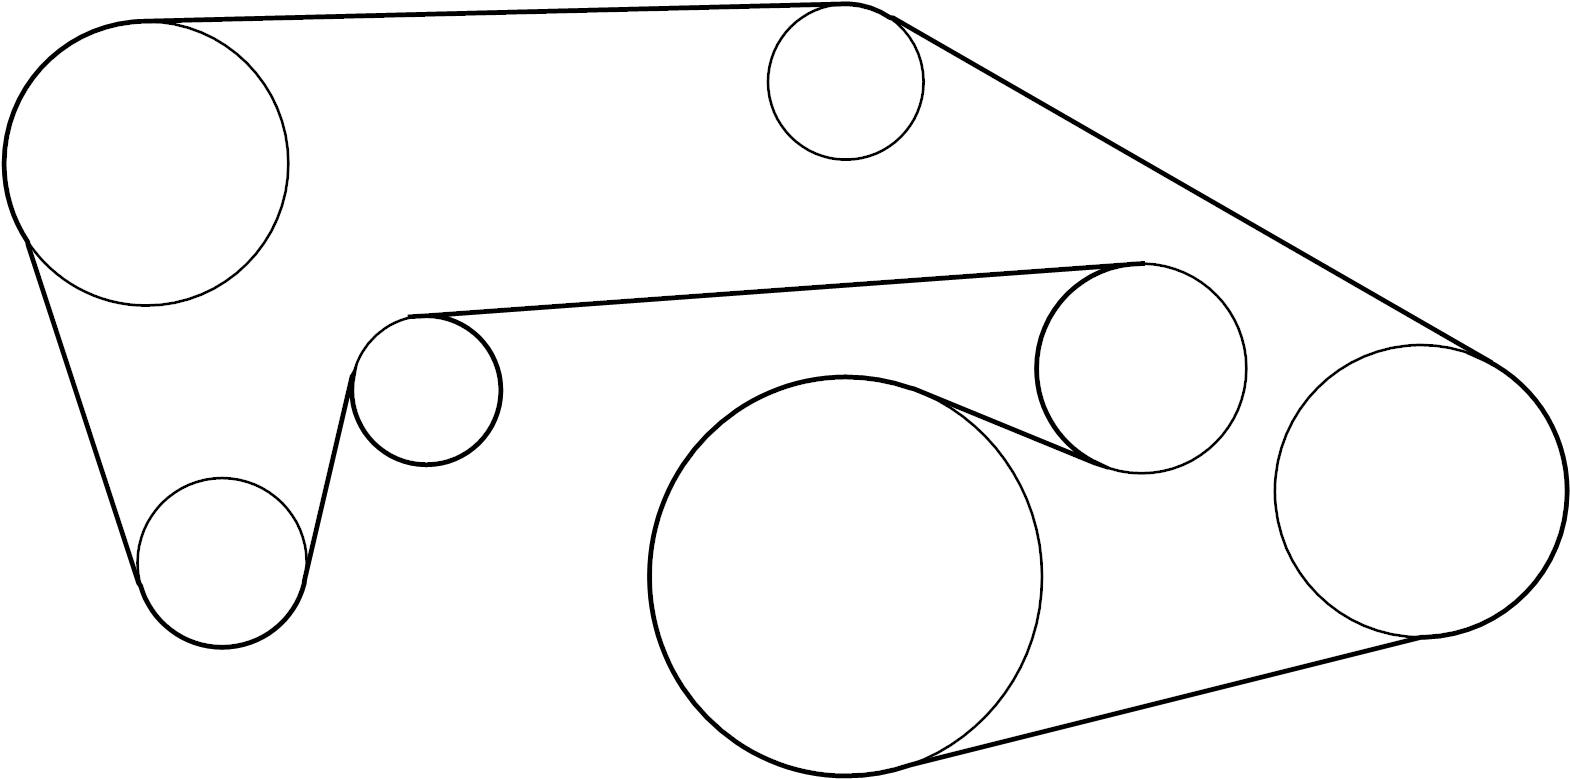 Infiniti G37 Serpentine Belt